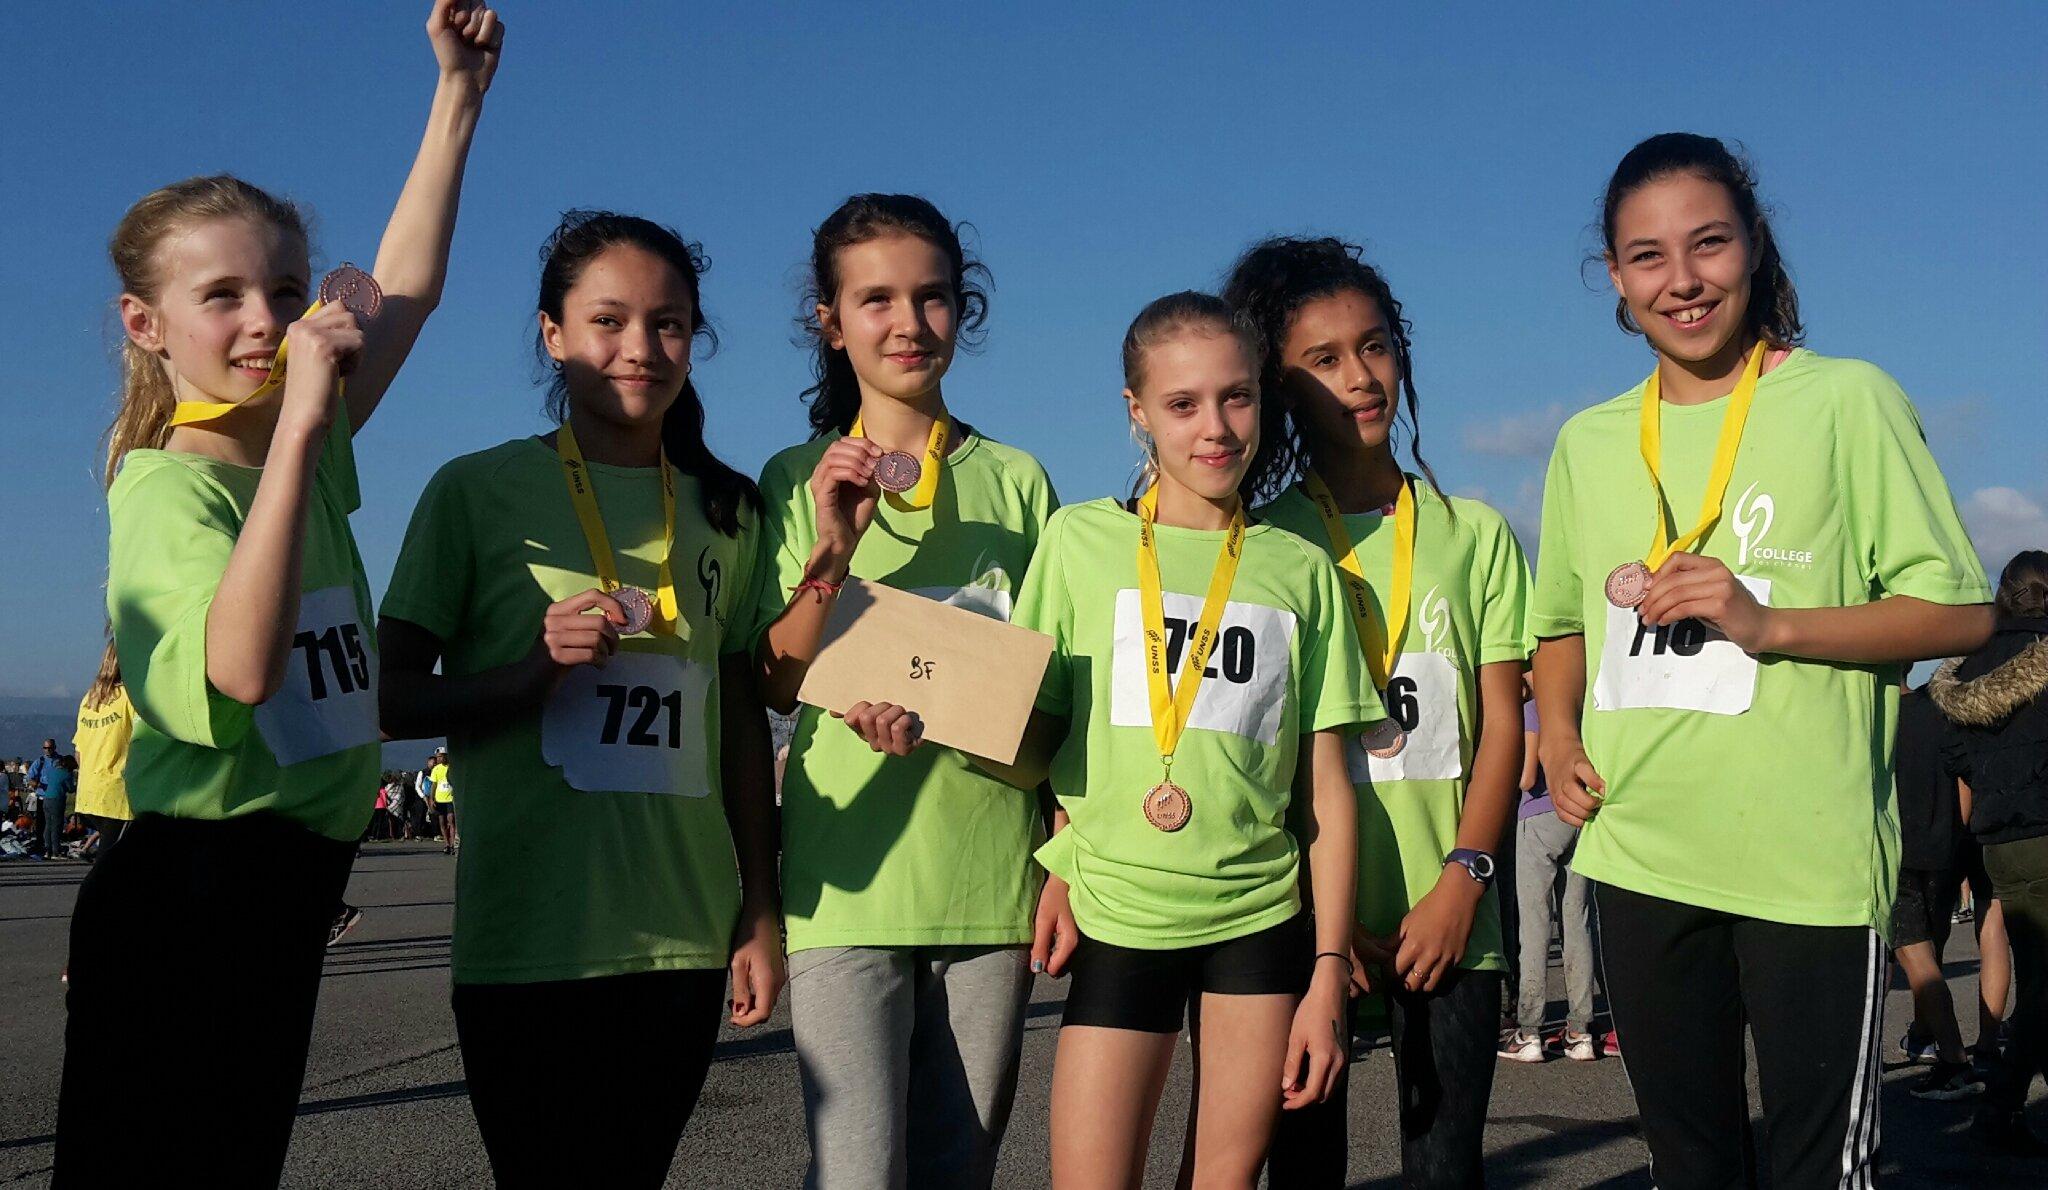 20151209_151547-médailles BF